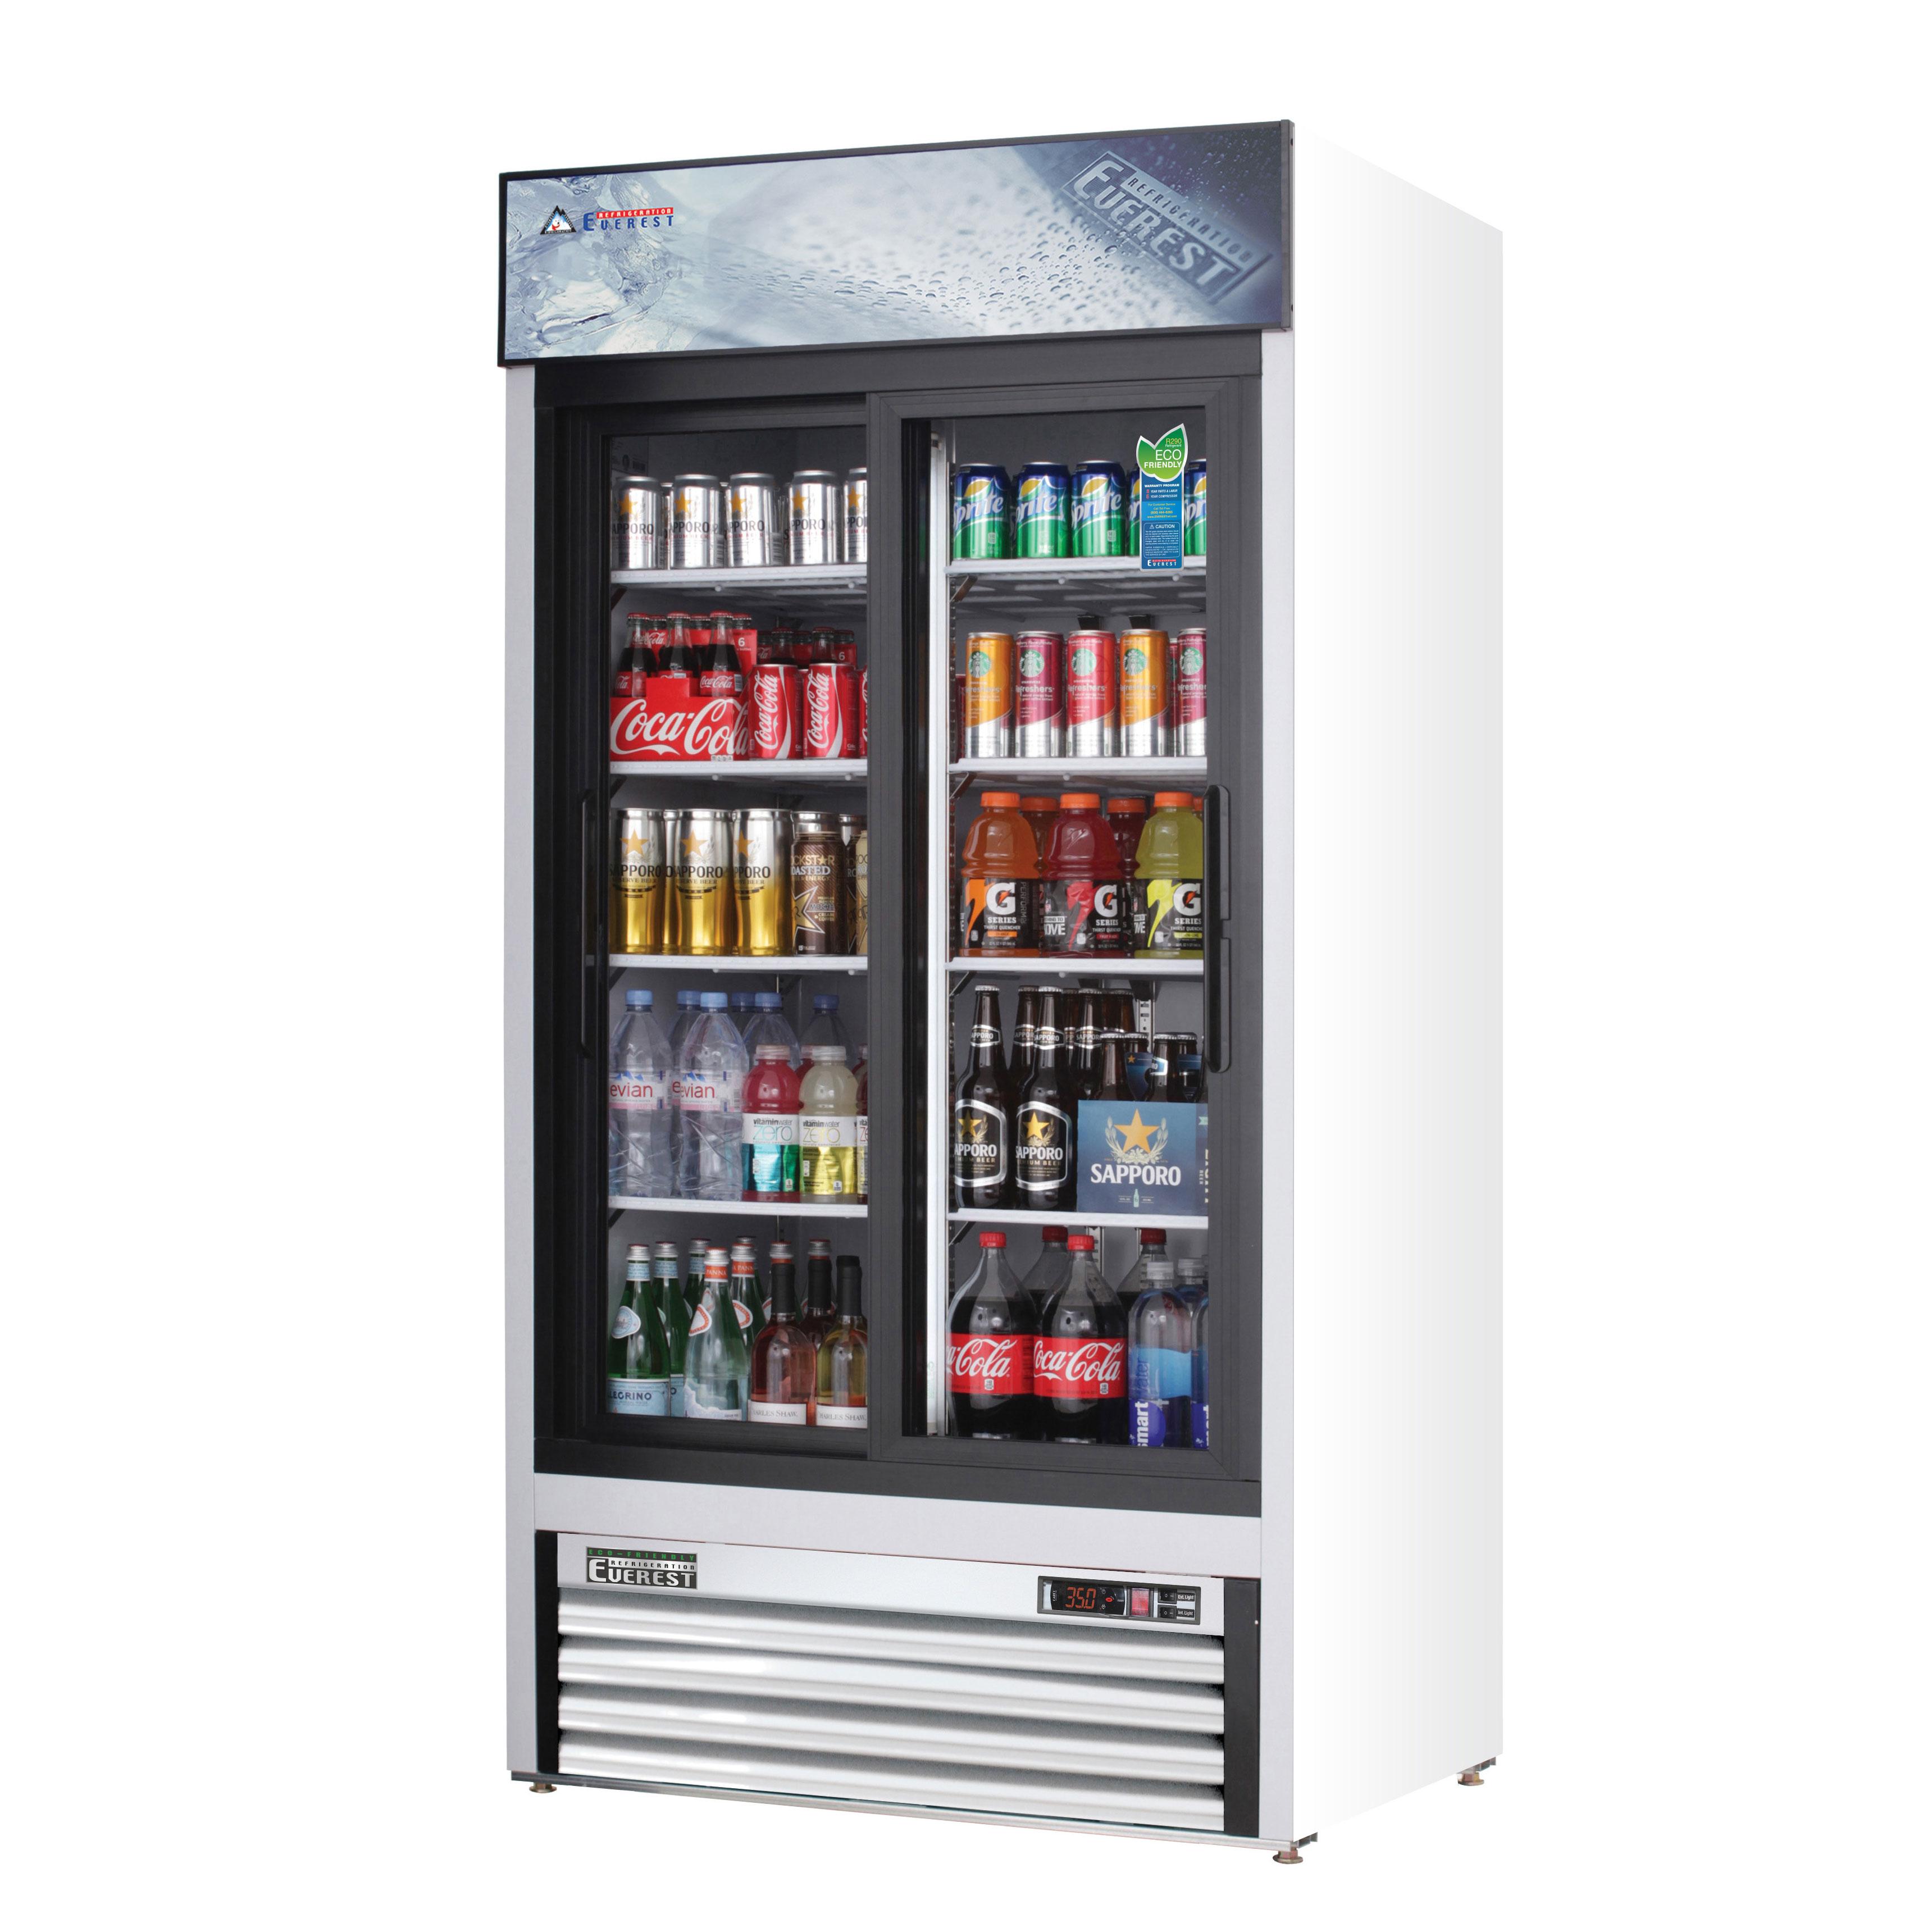 Everest Refrigeration EMGR33 refrigerator, merchandiser